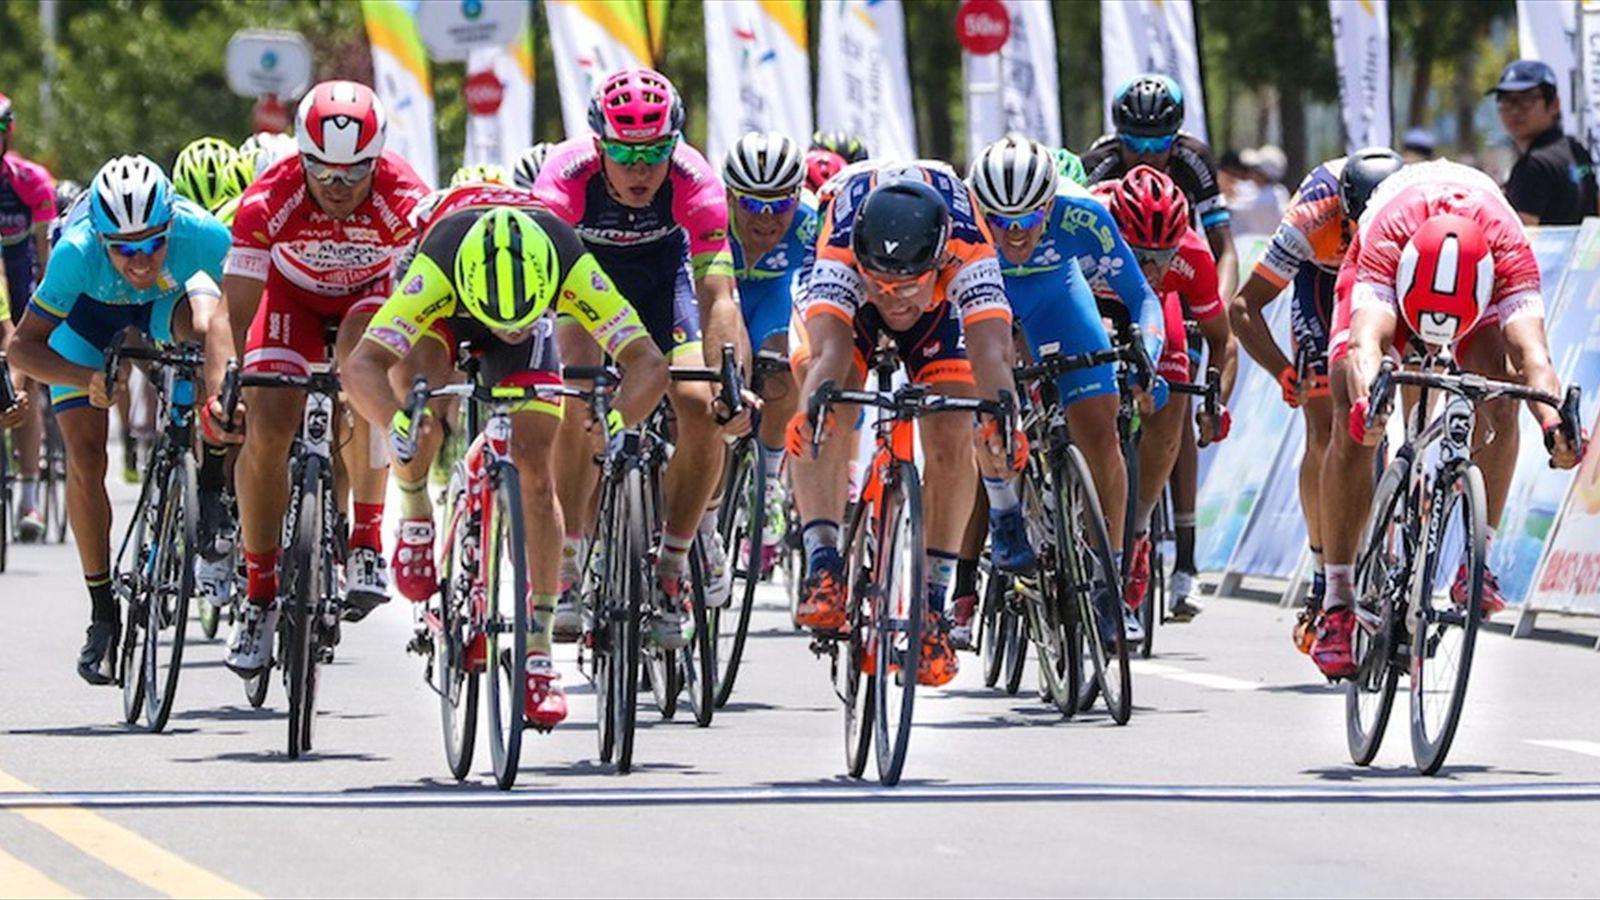 Thumbnail Credit (eurosport.co.uk): Italians and former teammates Nicolas Marini (Nippo-Vini Fantini) and Jakub Mareczko (Wilier Triestina-Southeast) battle to photo finish on stage 8 - Photo: Adrian Hoe / Tour of Qinghai Lake - Eurosport